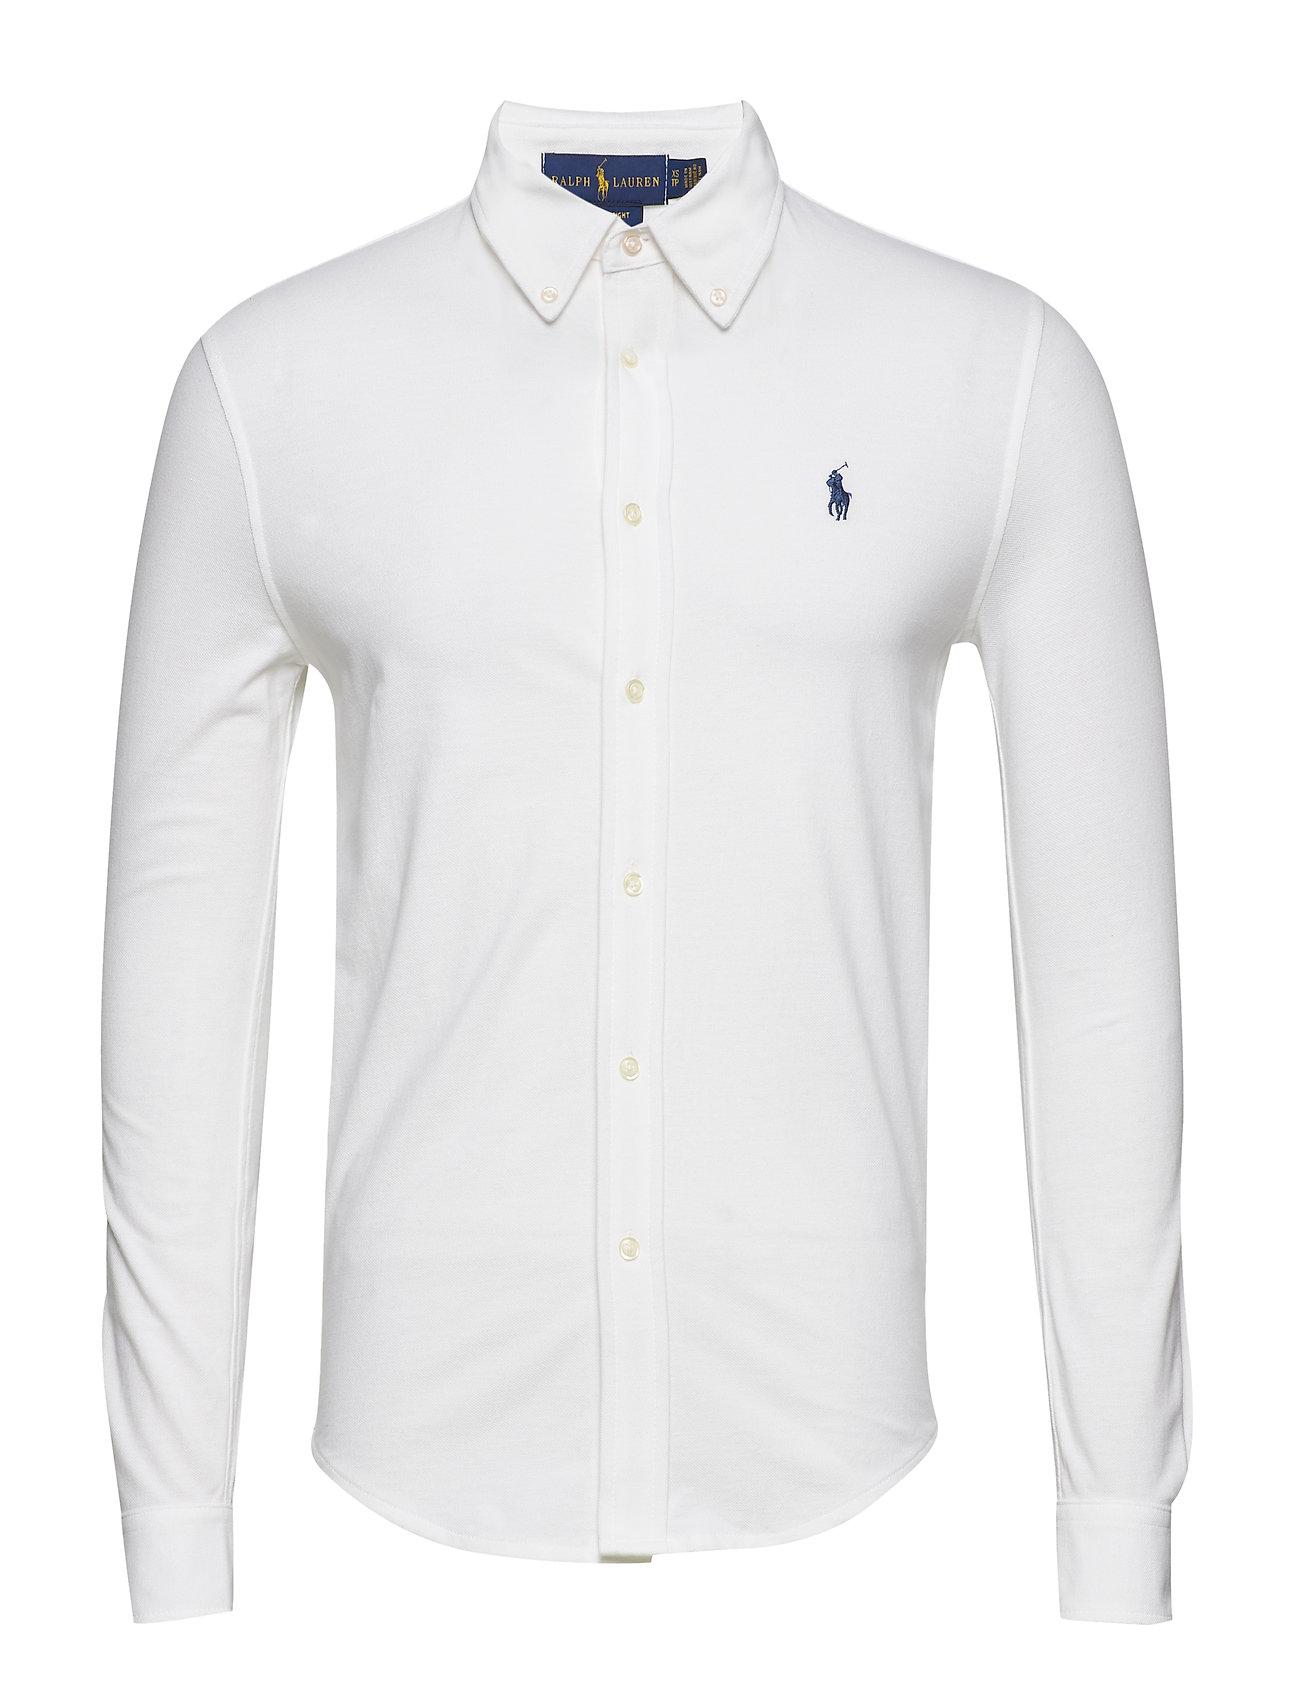 Polo Ralph Lauren Featherweight Mesh Shirt Ögrönlar